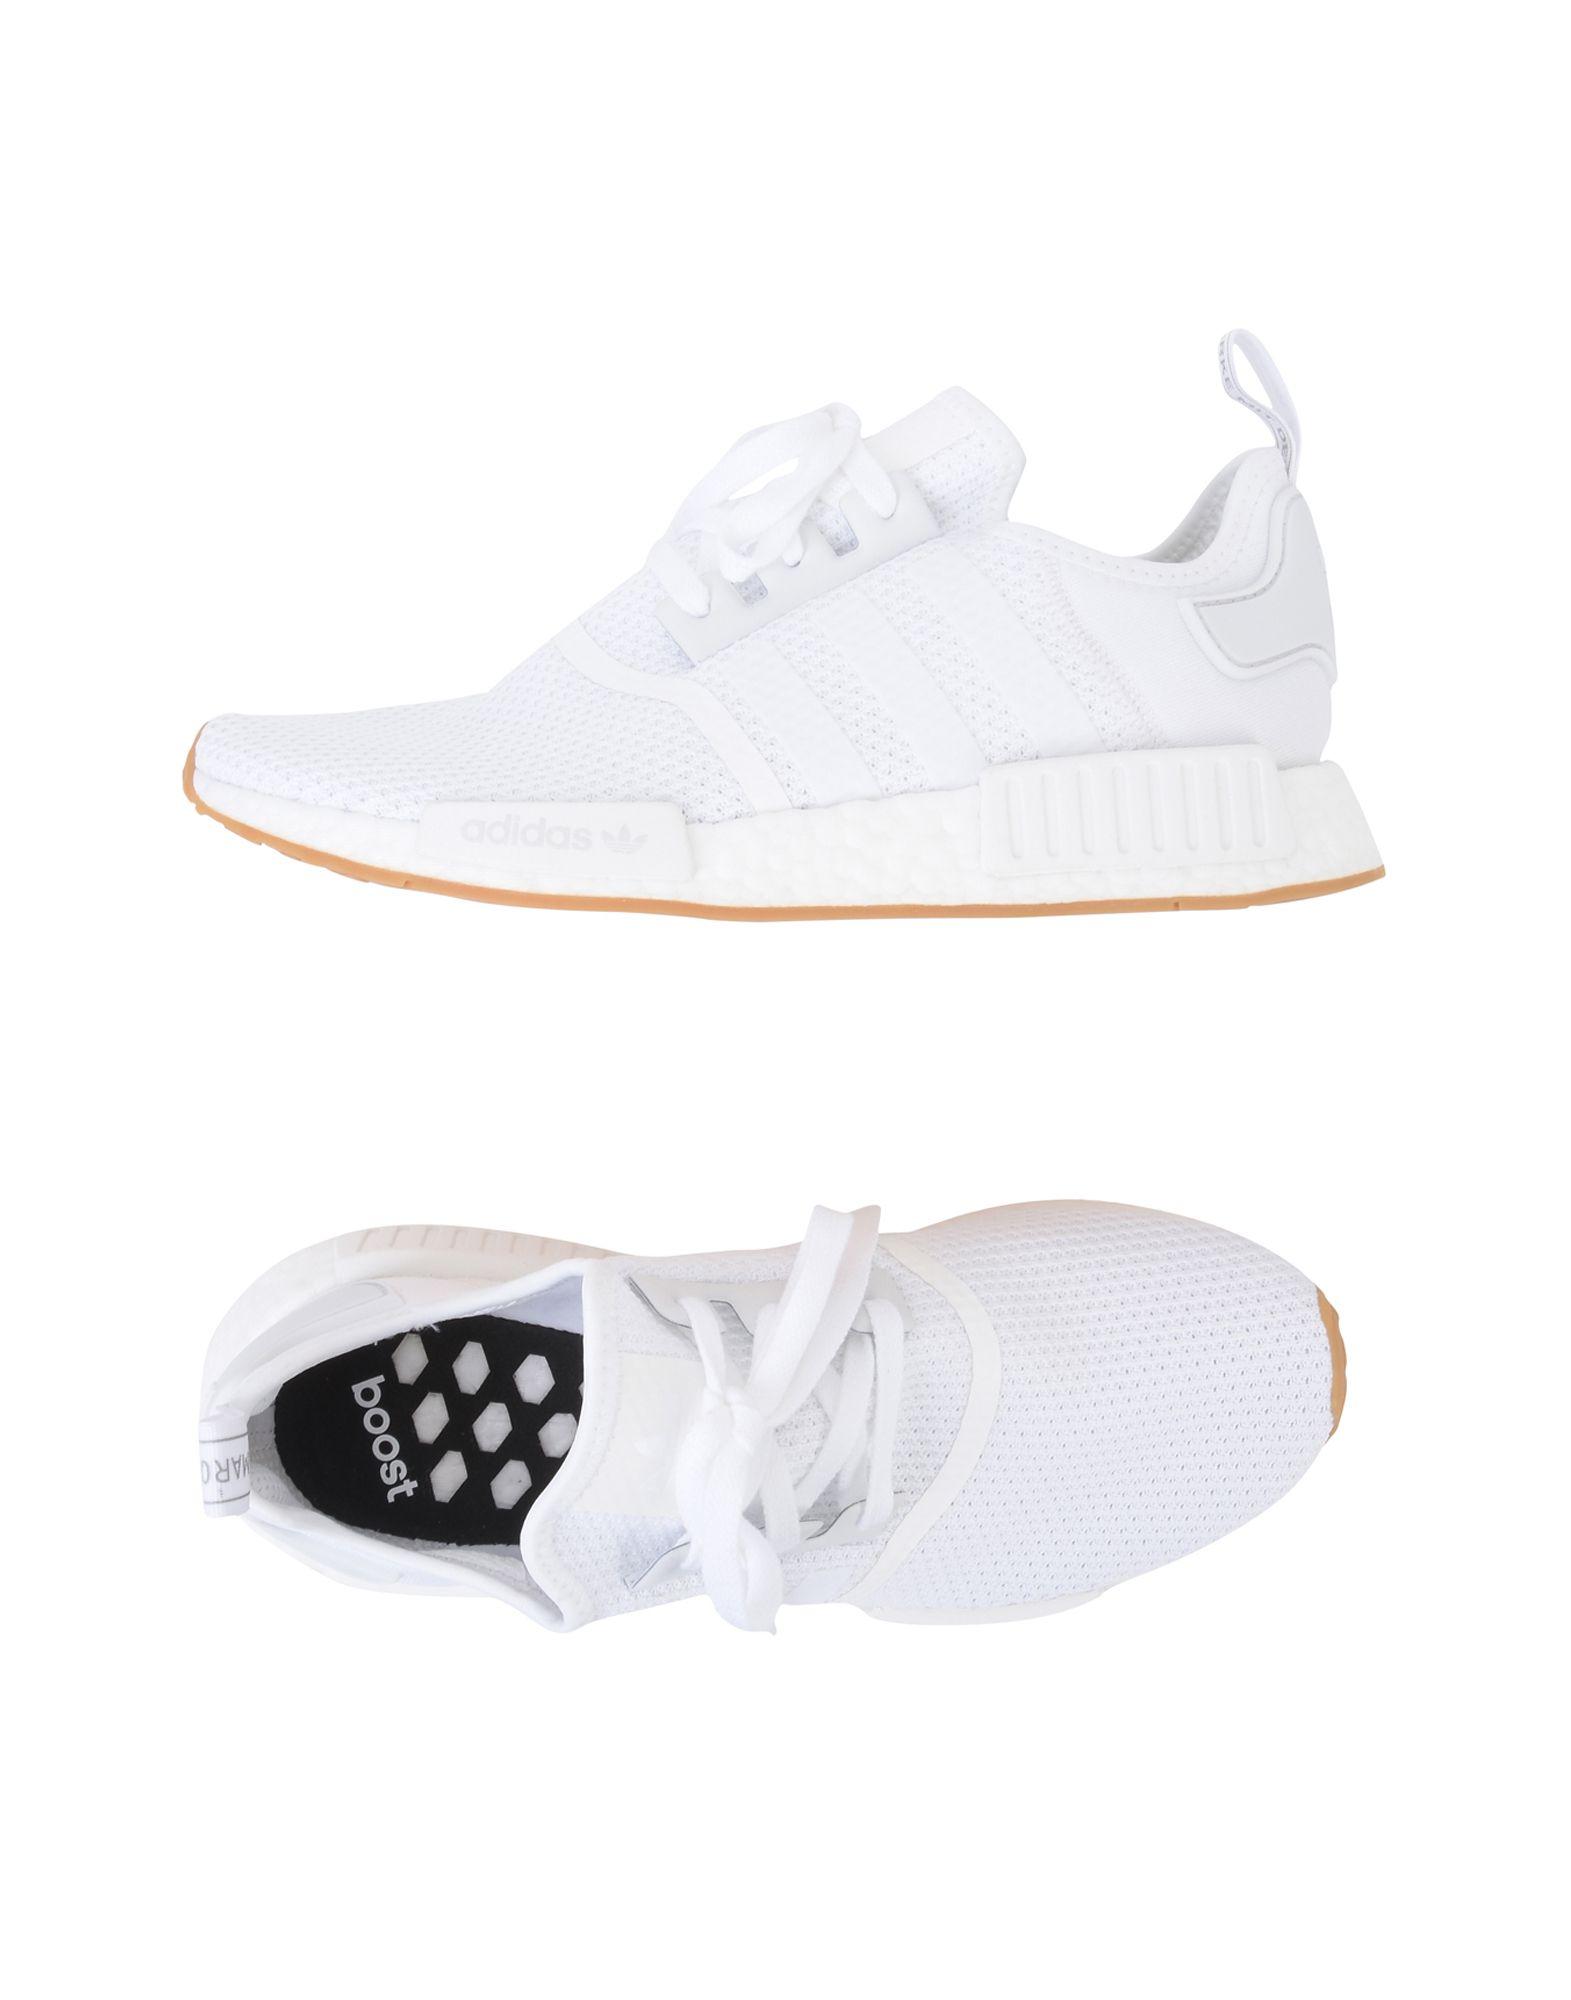 Sneakers Adidas Originals Nmd_R1 - Uomo - 11533556FG